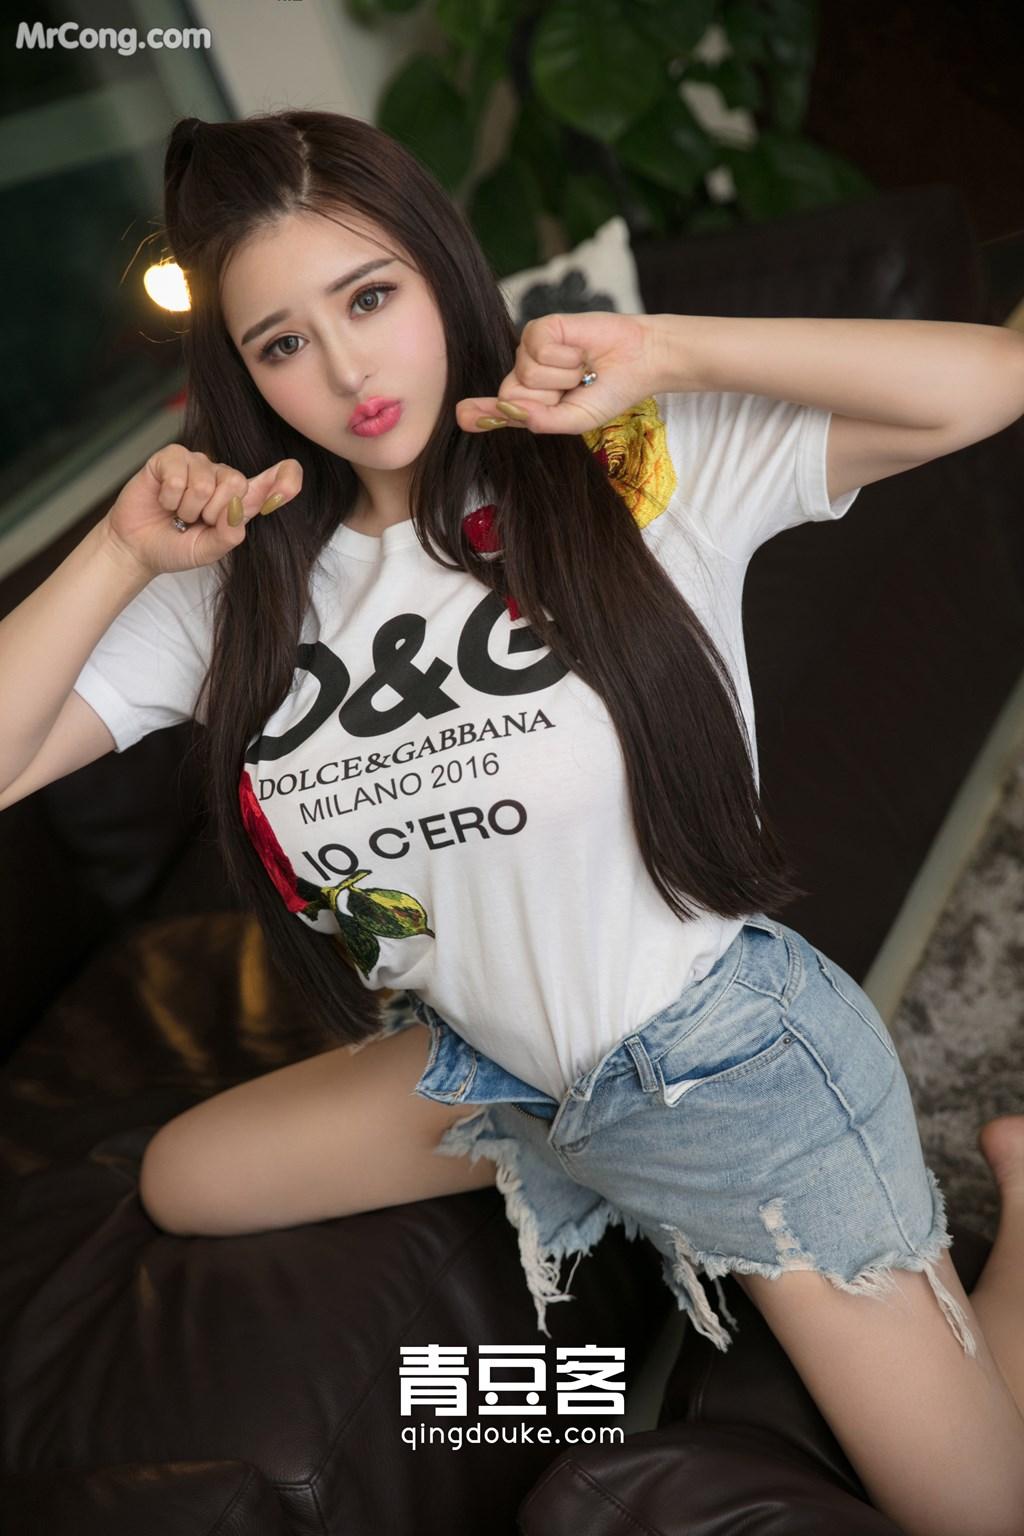 Image QingDouKe-2017-11-18-Jin-Baby-MrCong.com-009 in post QingDouKe 2017-11-18: Người mẫu Jin Baby (金baby) (49 ảnh)